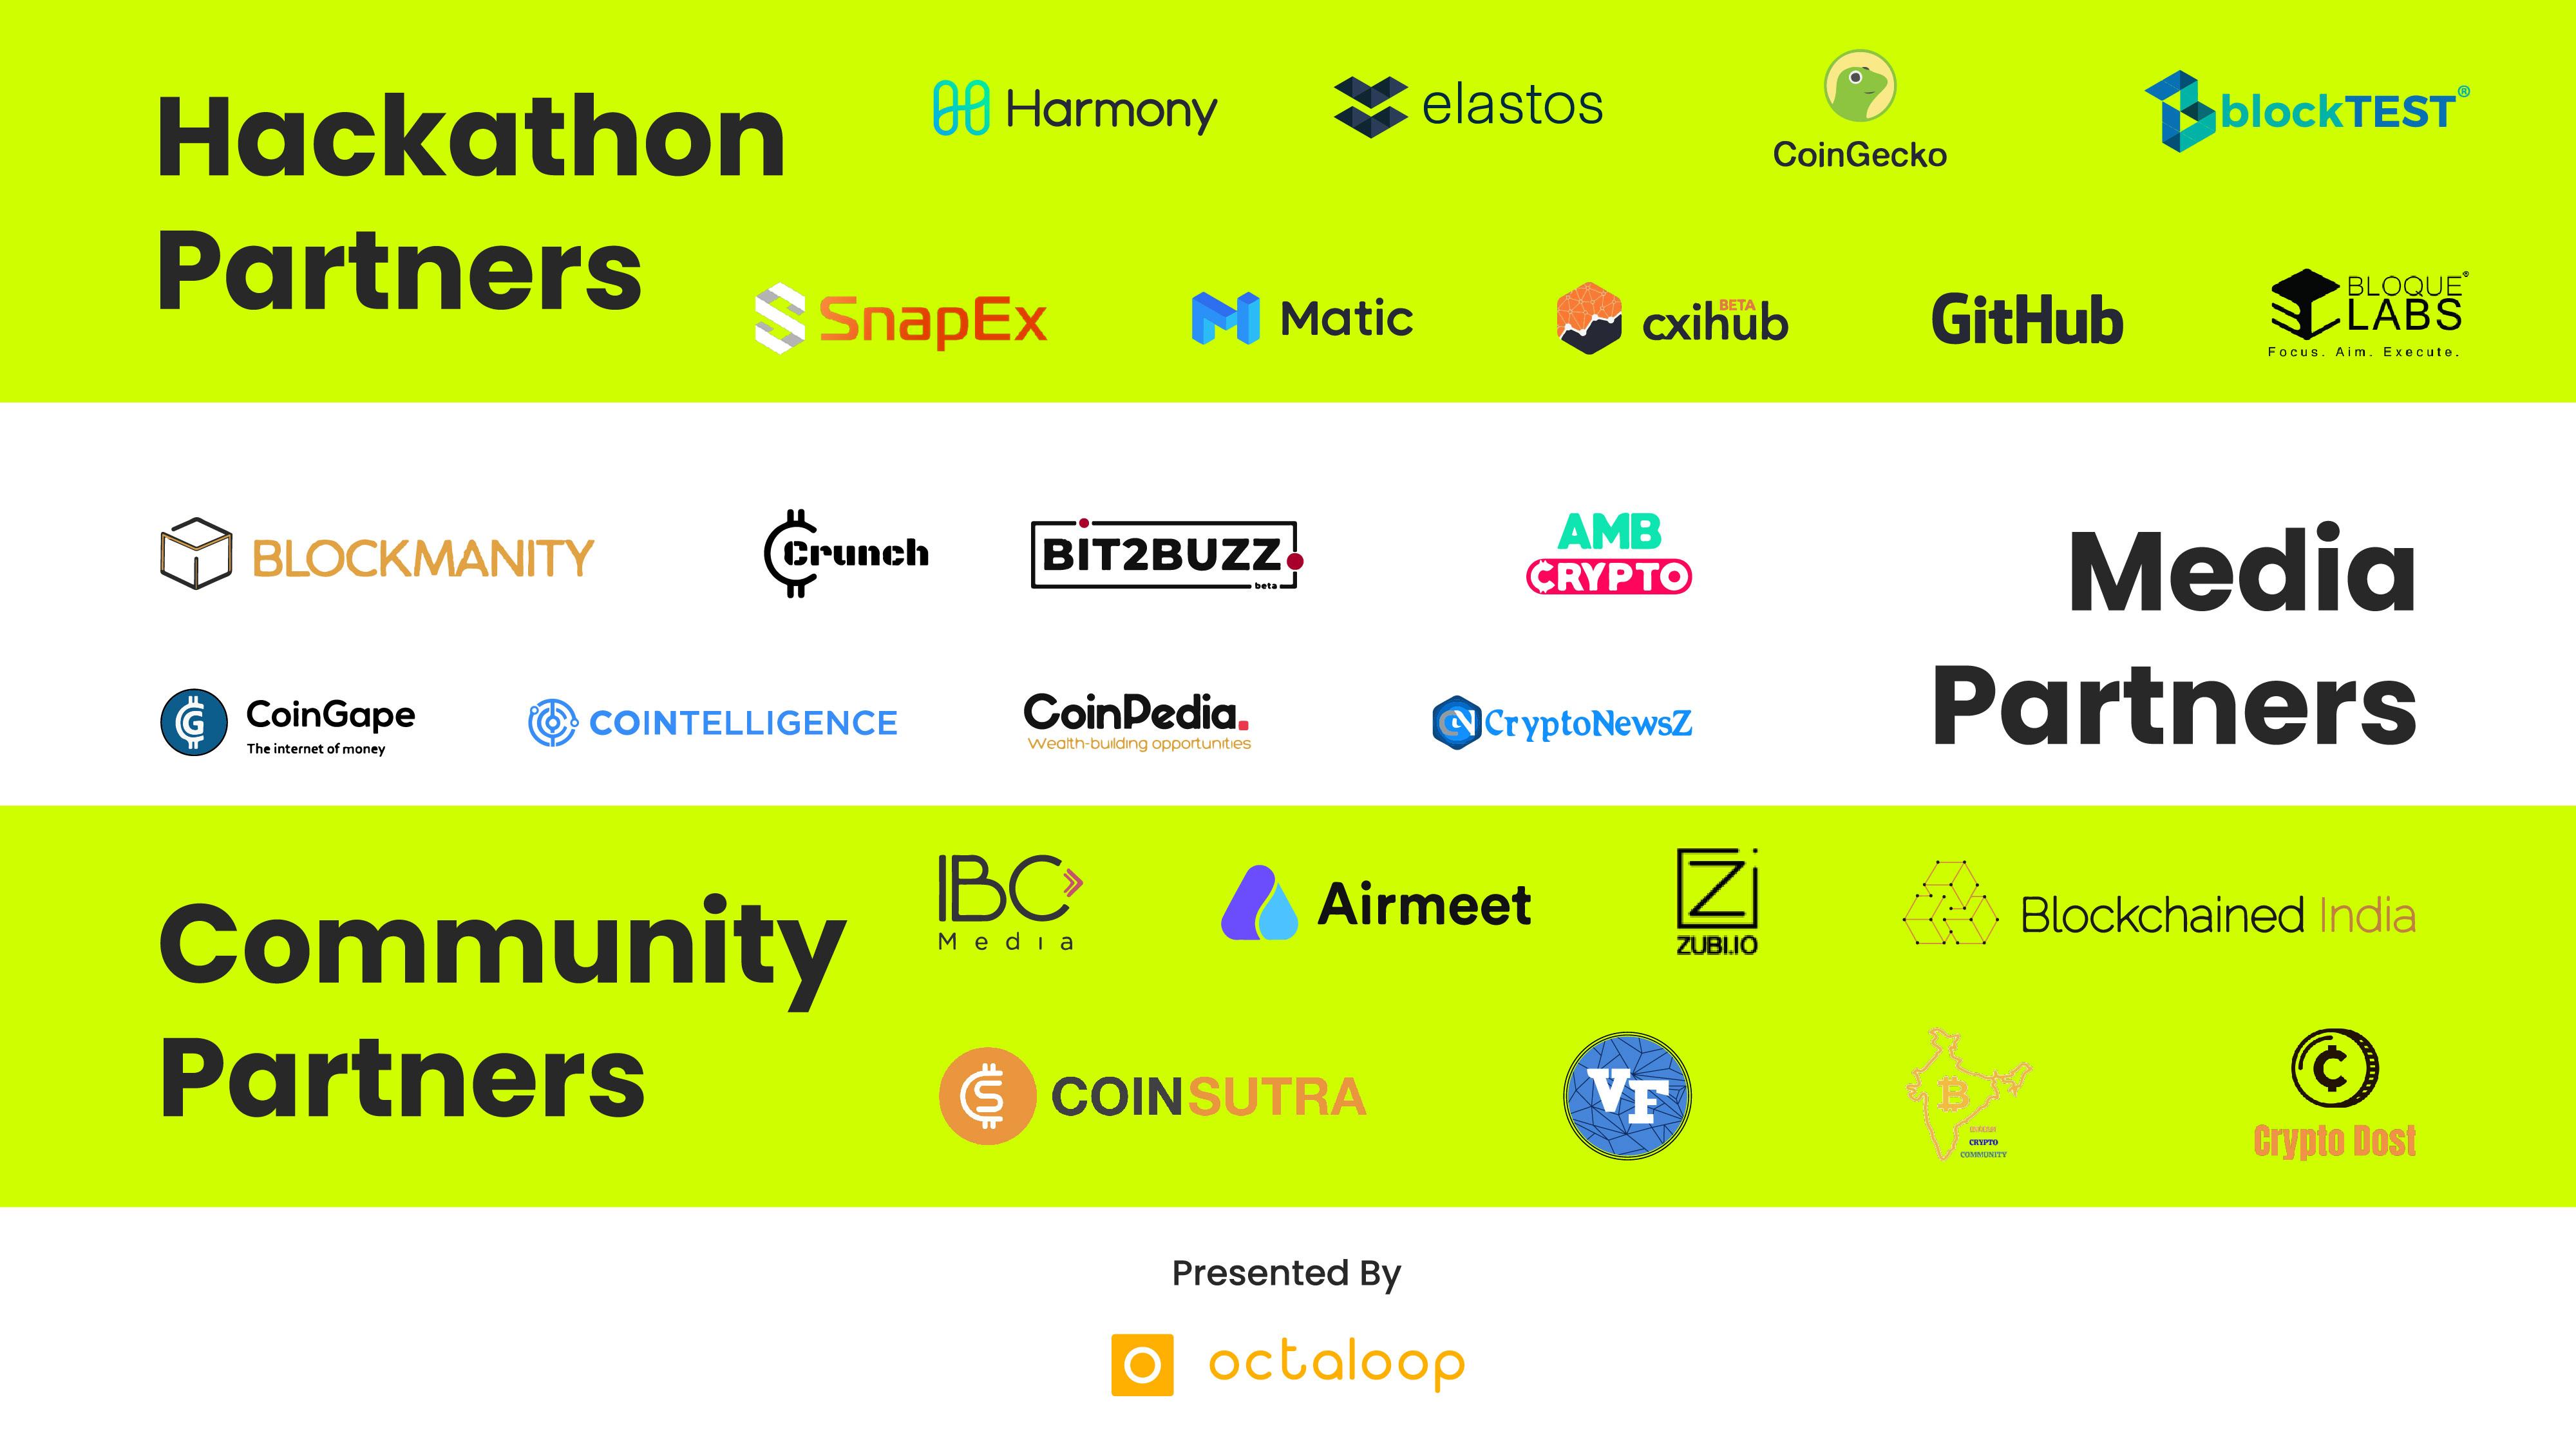 All hackathon partners